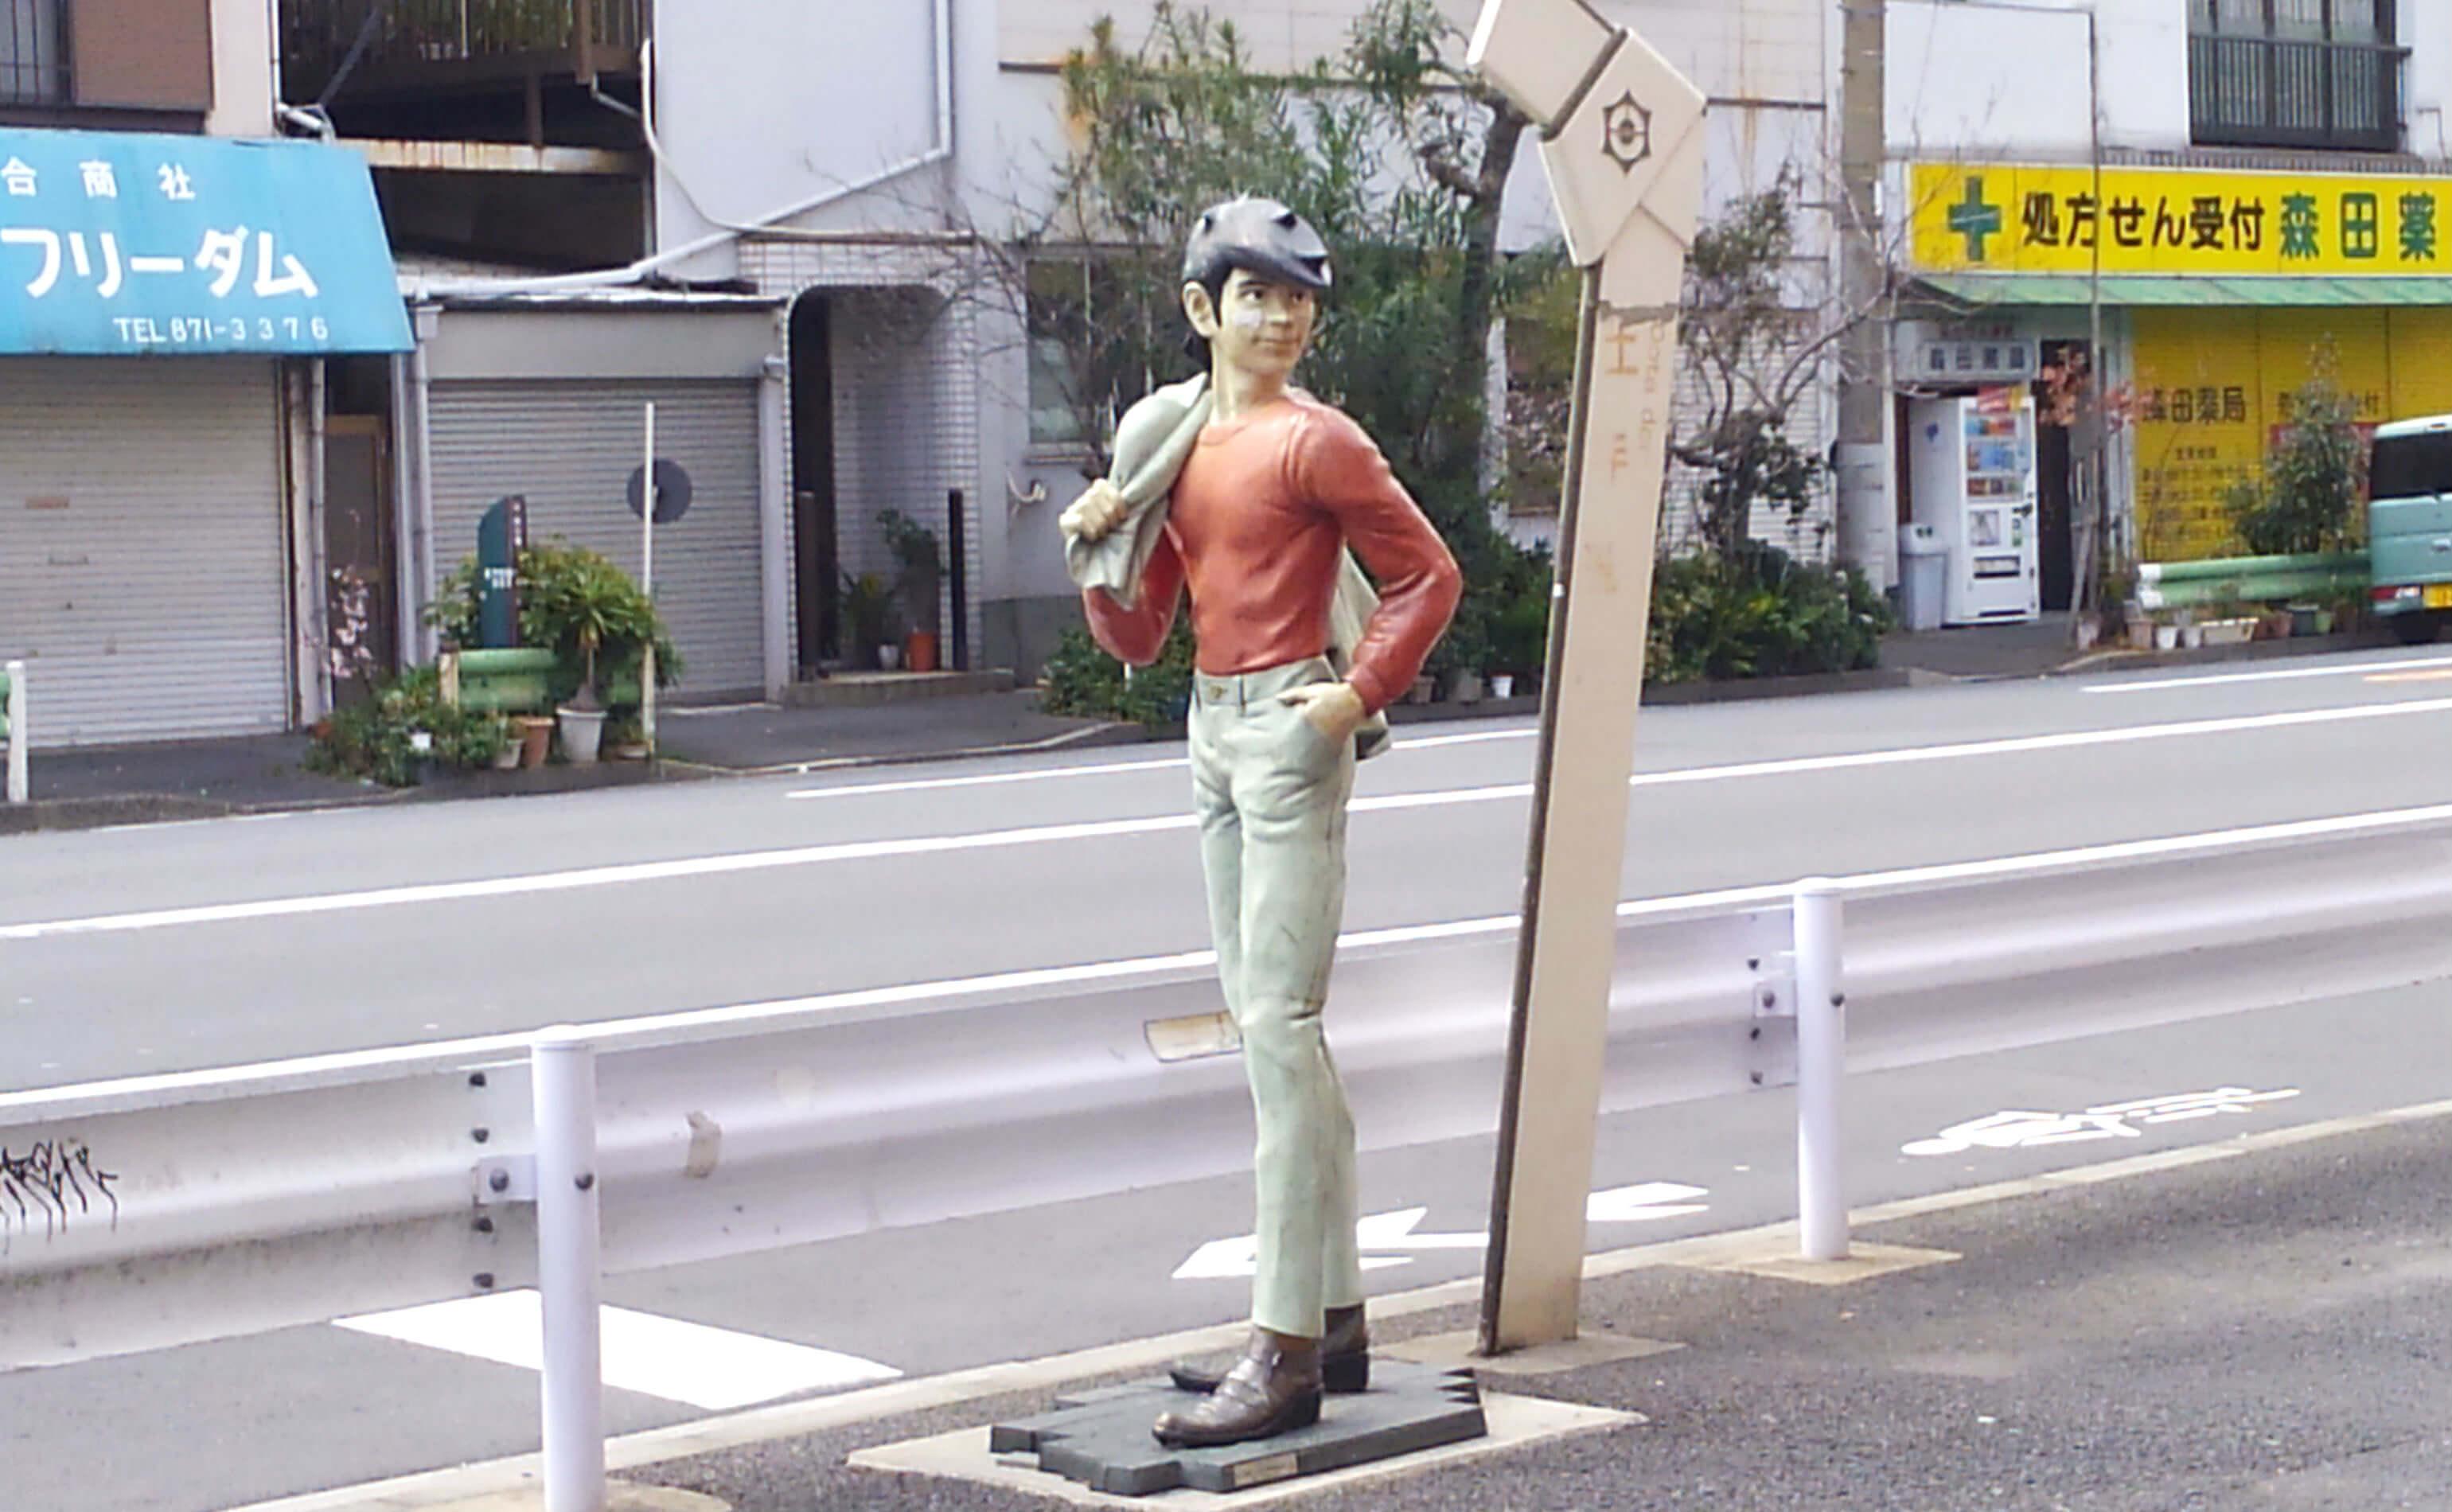 statue_Joe Yabuki_Sanya